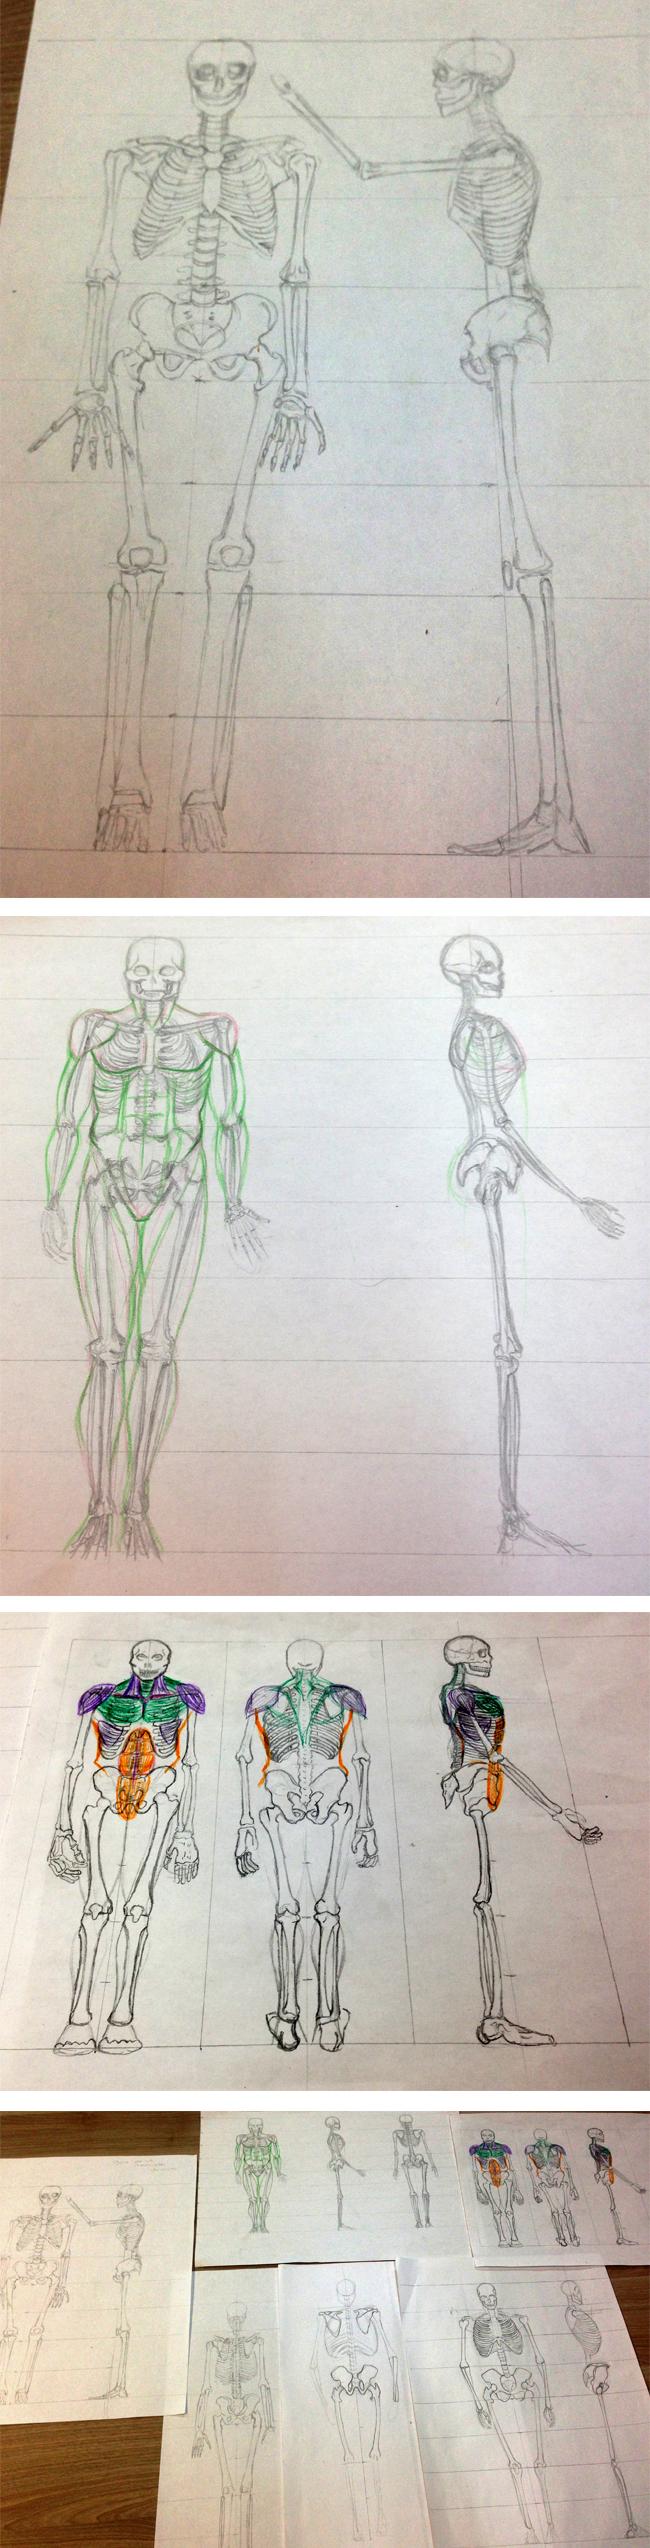 nuevos_ejercicios_alumnos_curso_dibujo_profesional_diseno_esqueleto_anatomia_academiac10_madrid